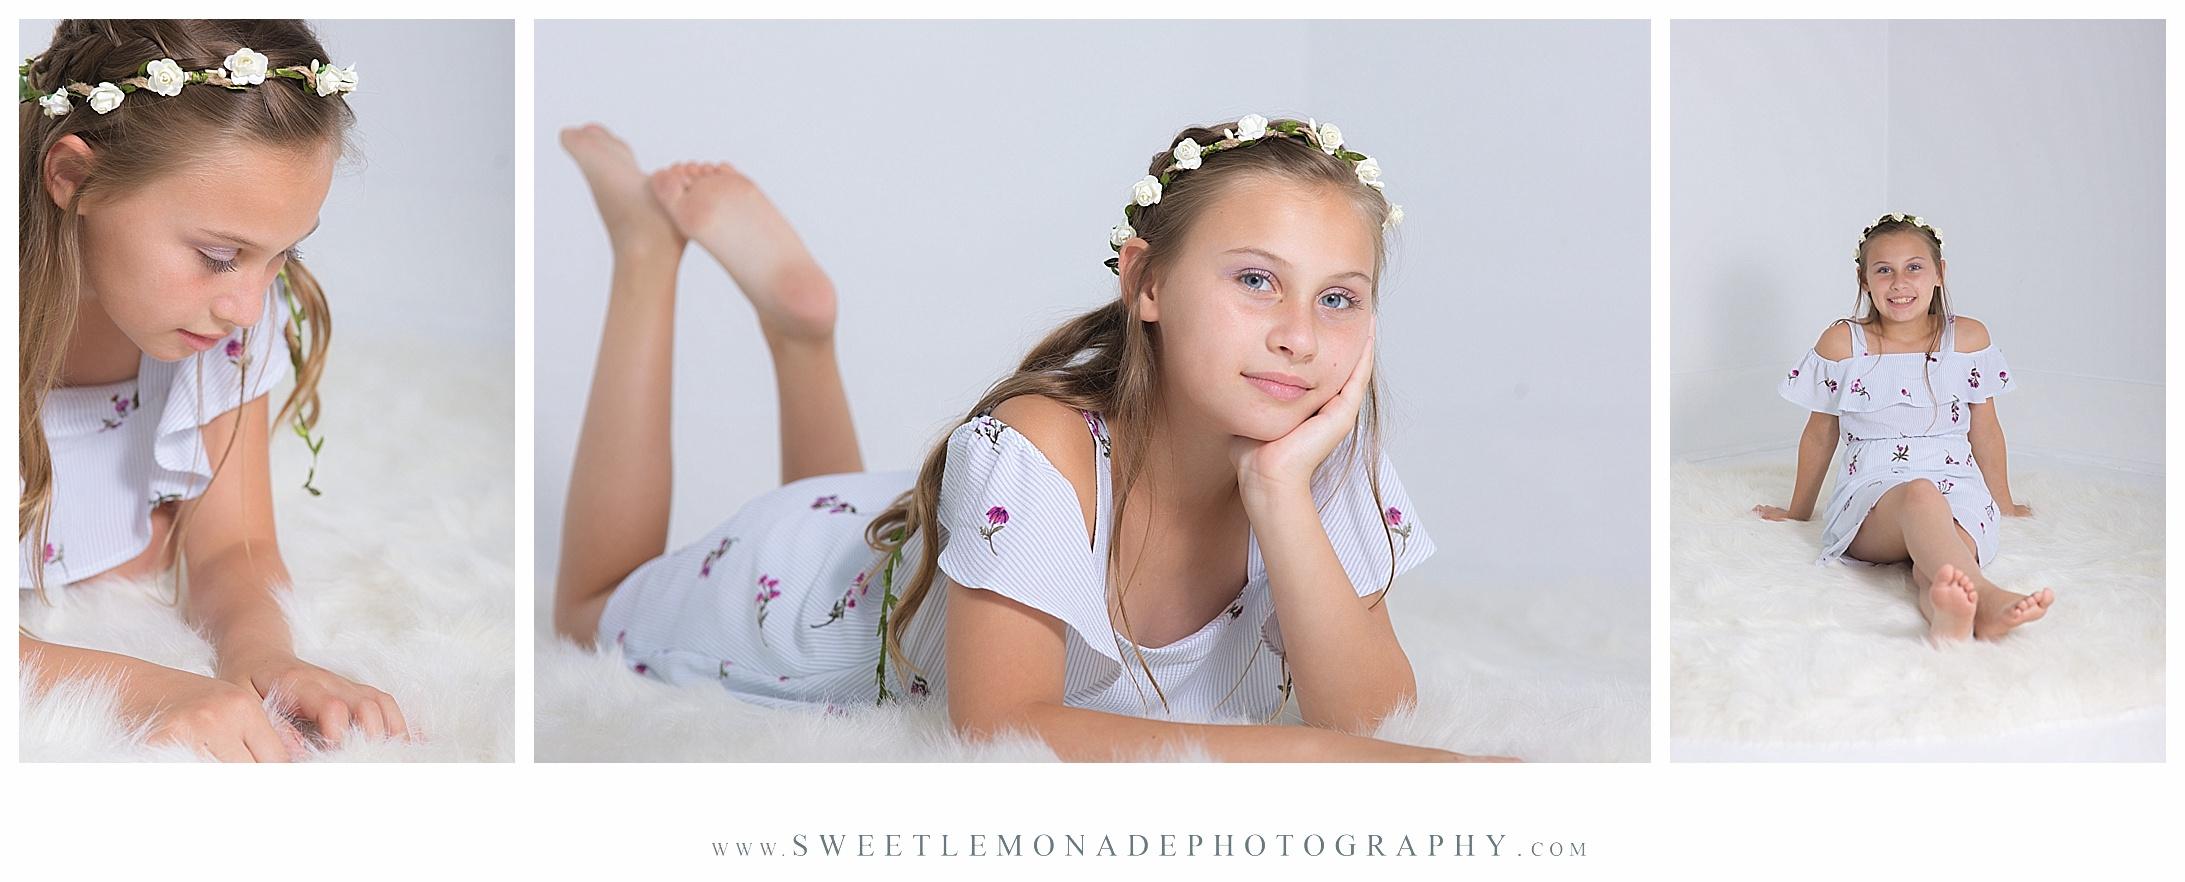 champaign-senior-photographer-sweet-lemonade-photography-floral-crown-tween-pictures_2245.jpg